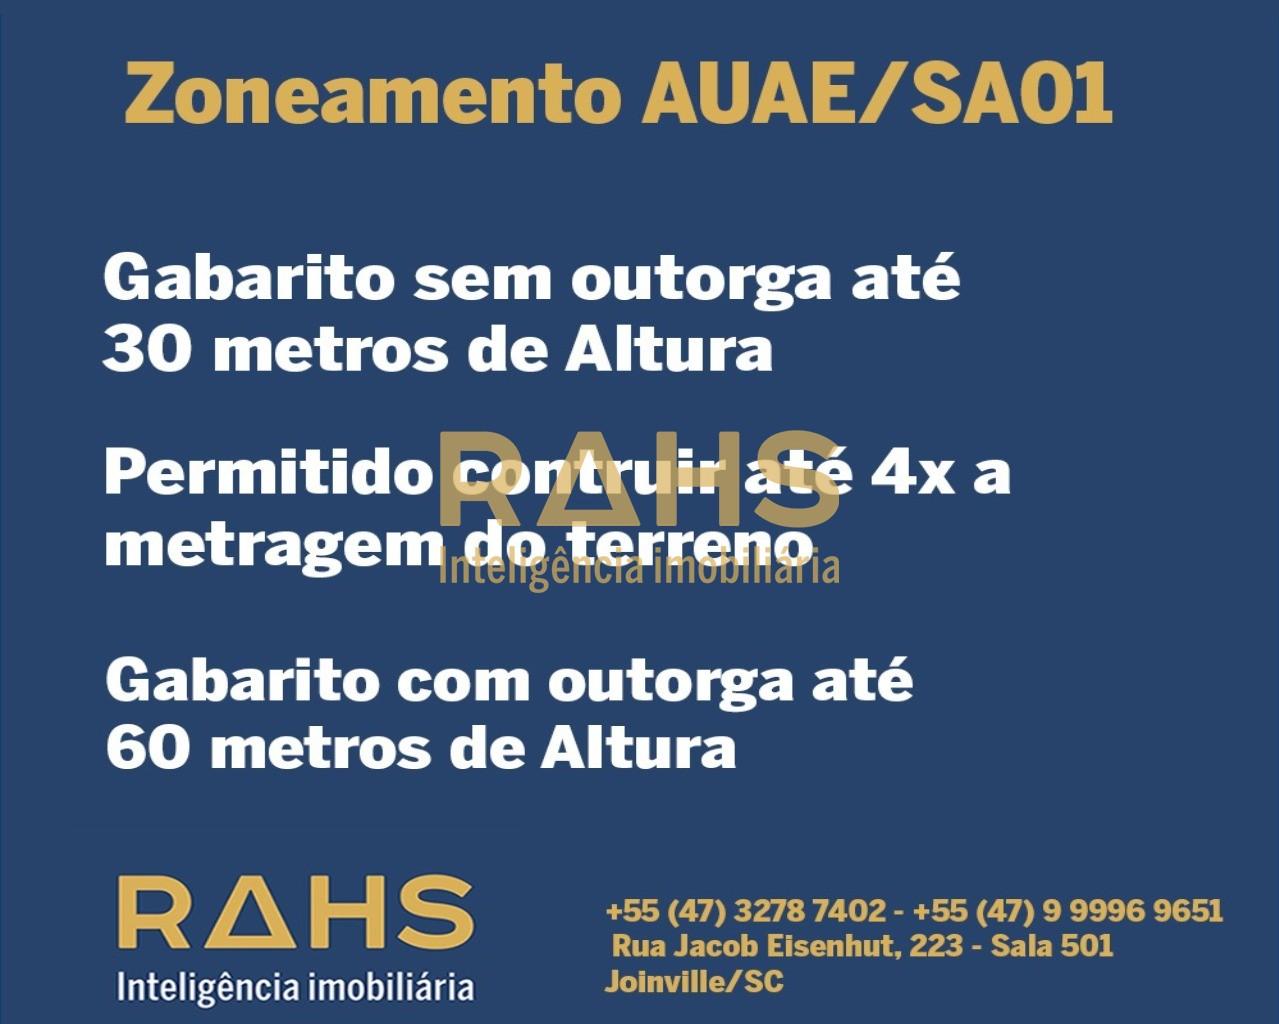 https://s3-sa-east-1.amazonaws.com/grupo-union/20655/2021/09/fb3a74fb059e4258c586dc4f042dd1bf.jpg